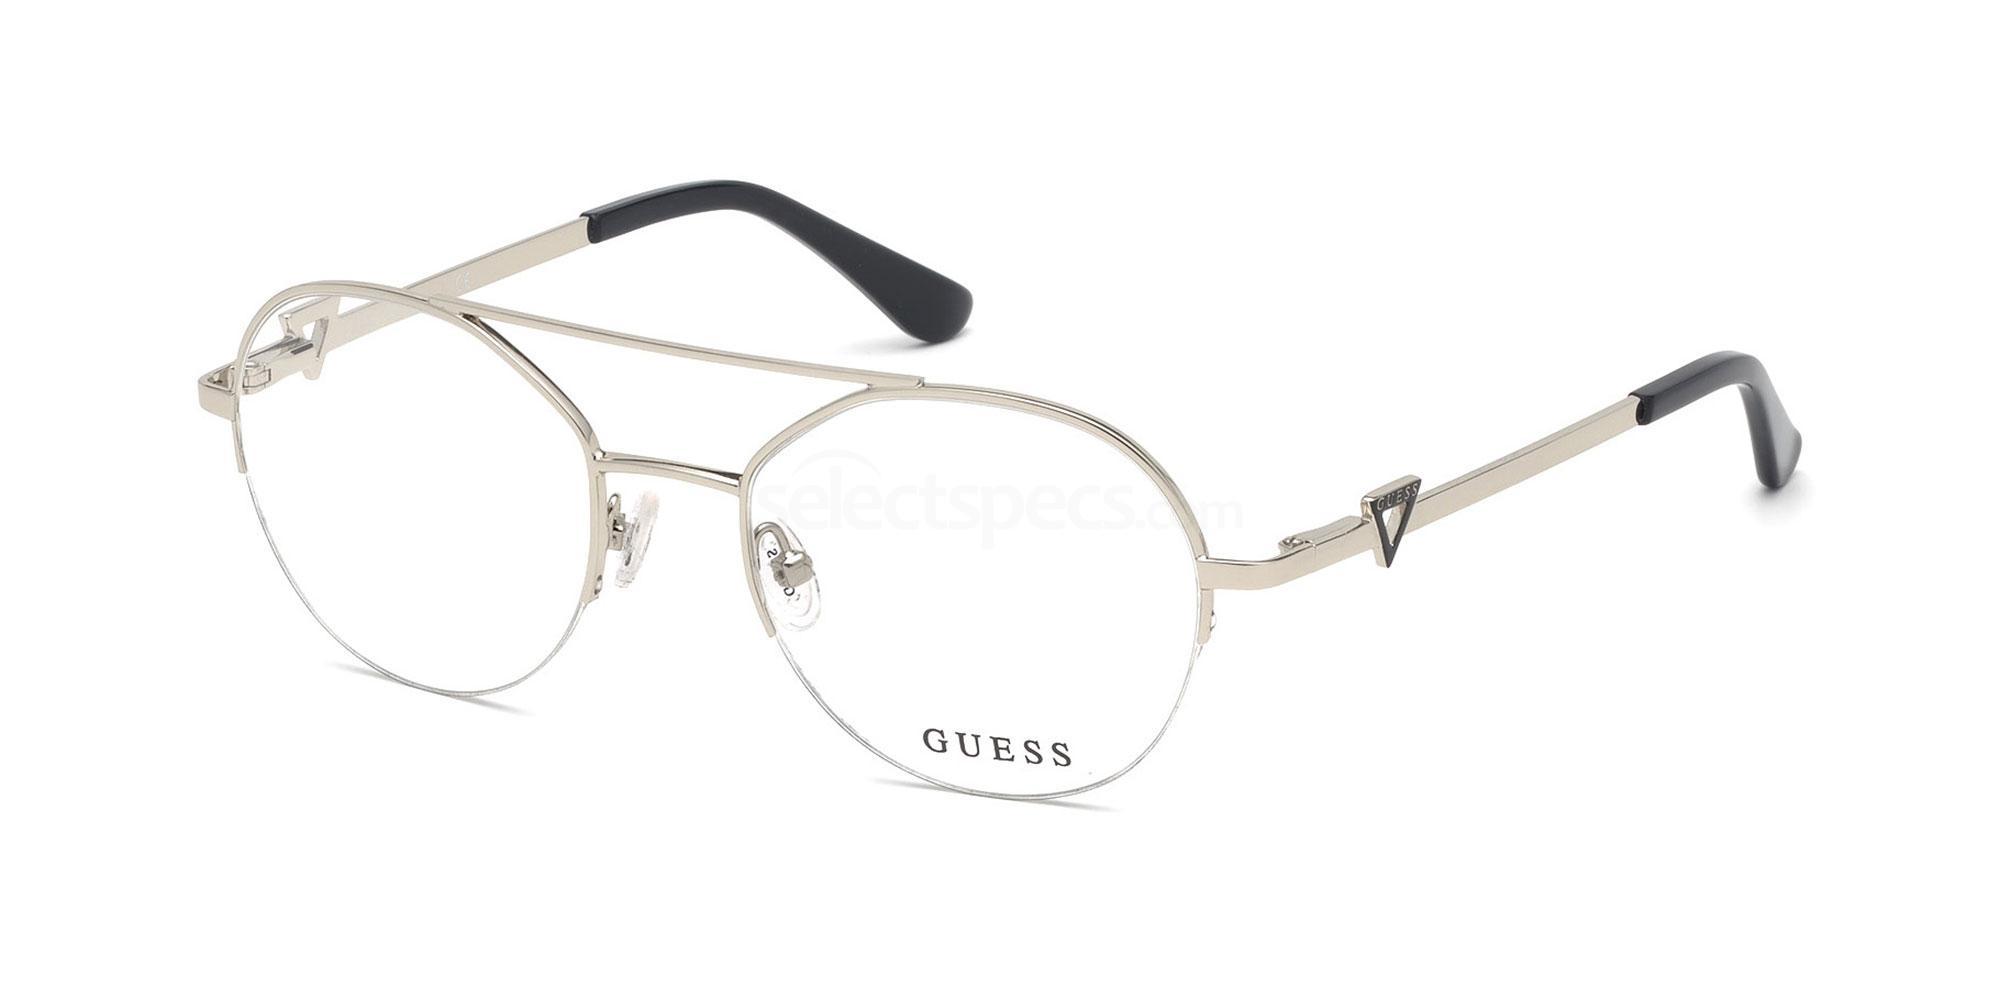 010 GU2729 Glasses, Guess